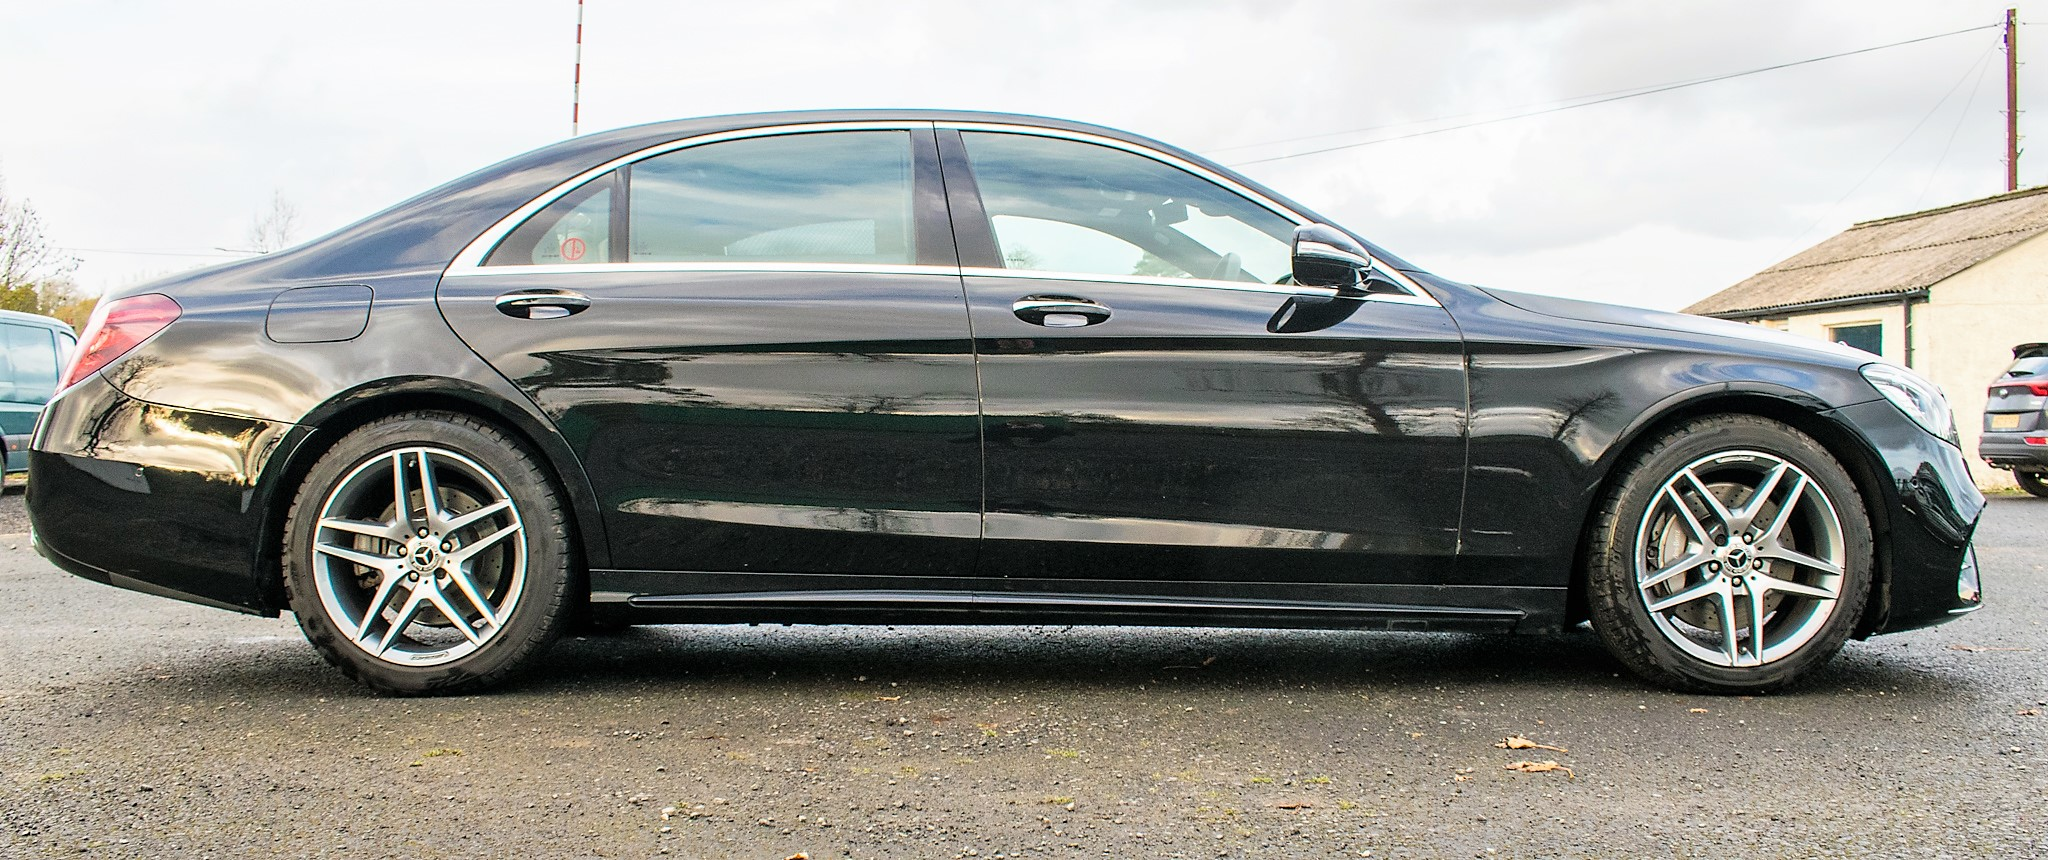 Mercedes Benz S450 L AMG Line Executive auto petrol 4 door saloon car Registration Number: FX68 - Image 7 of 33